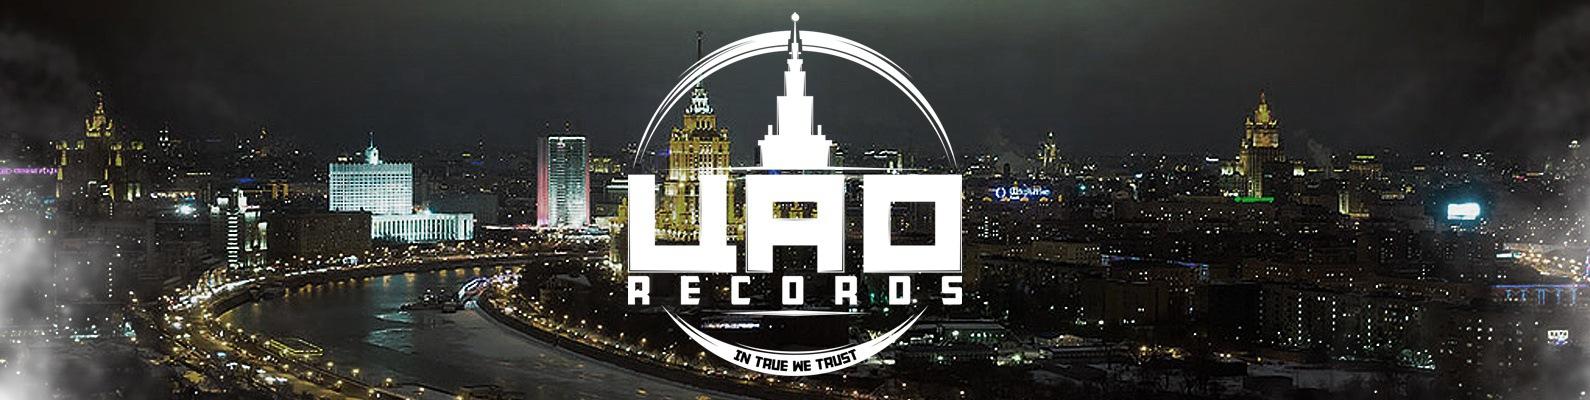 картинки с логотипом цао рекордс какие-то редкие моменты